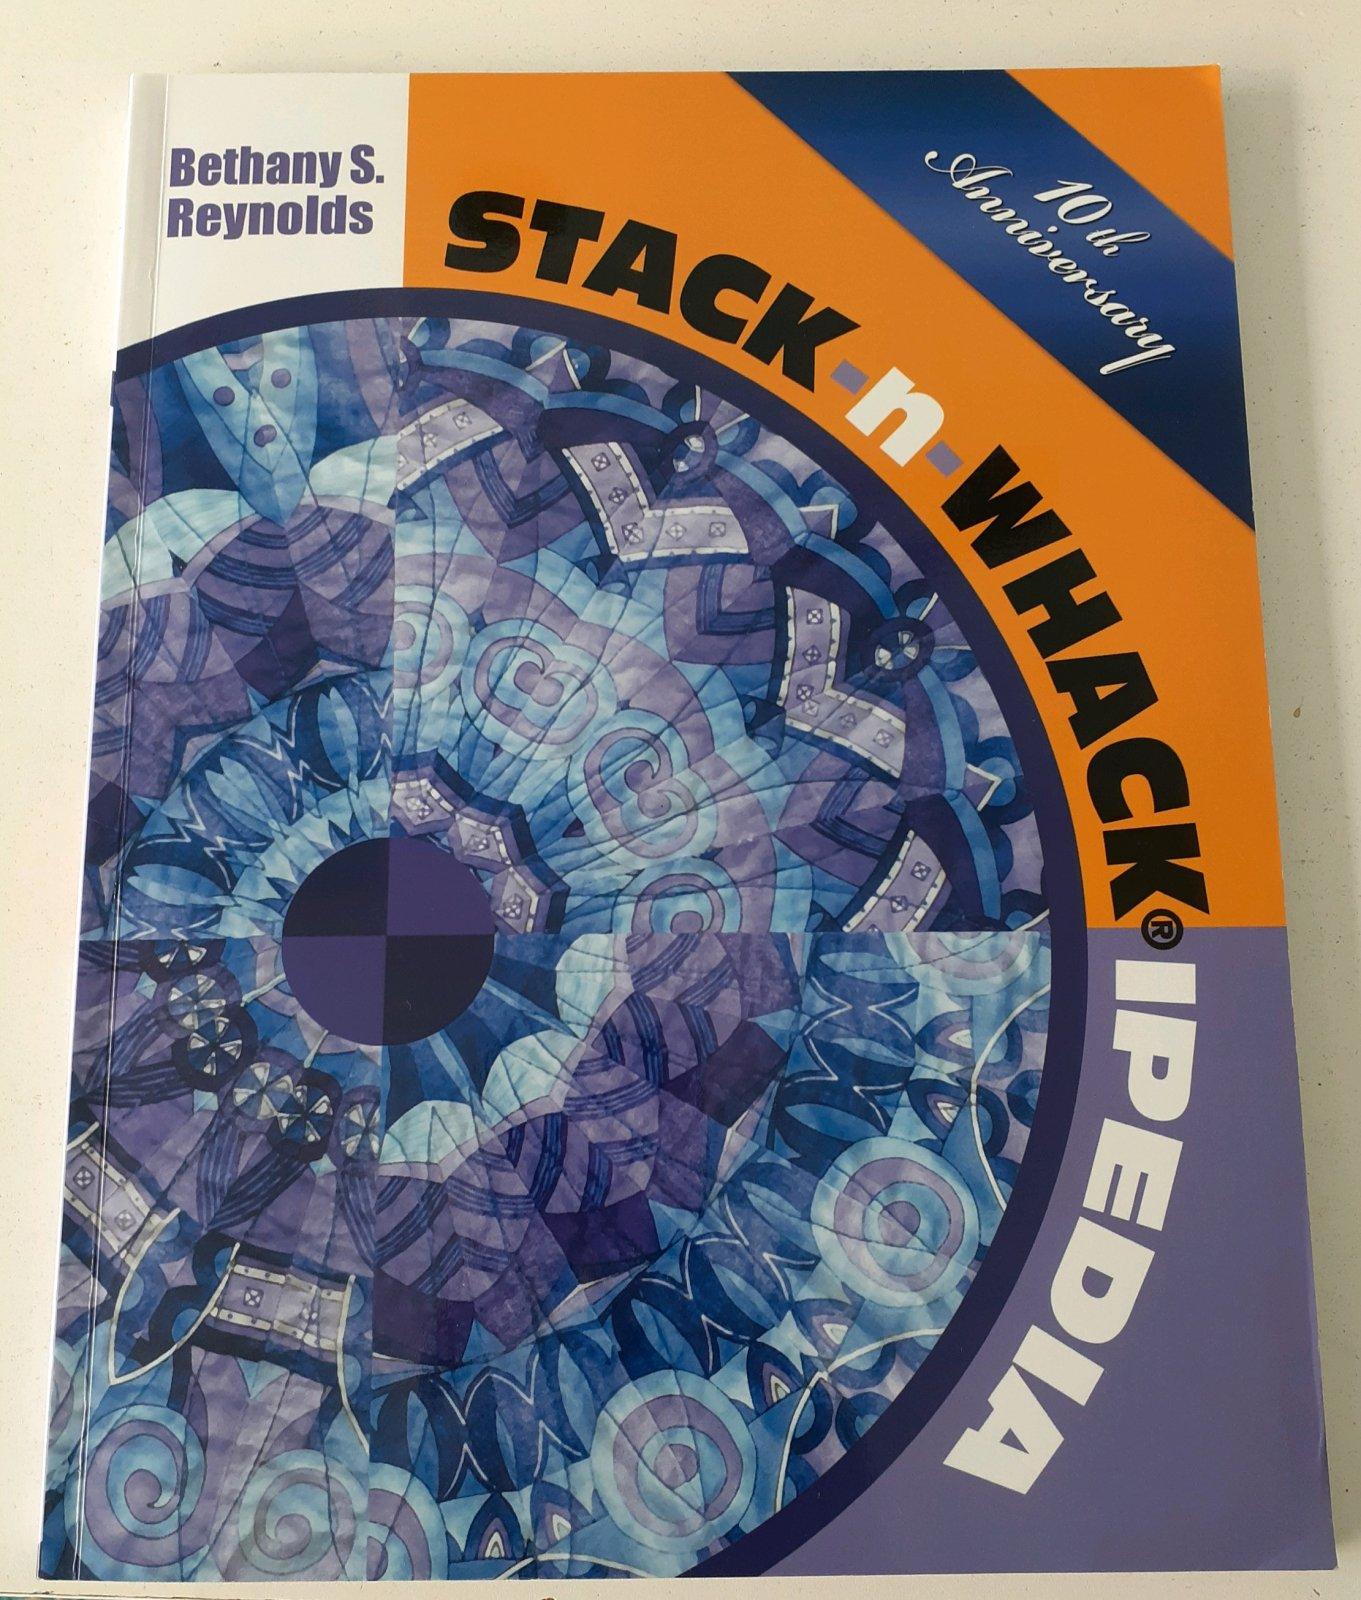 Stack-n- Whack - 10th Anniversary